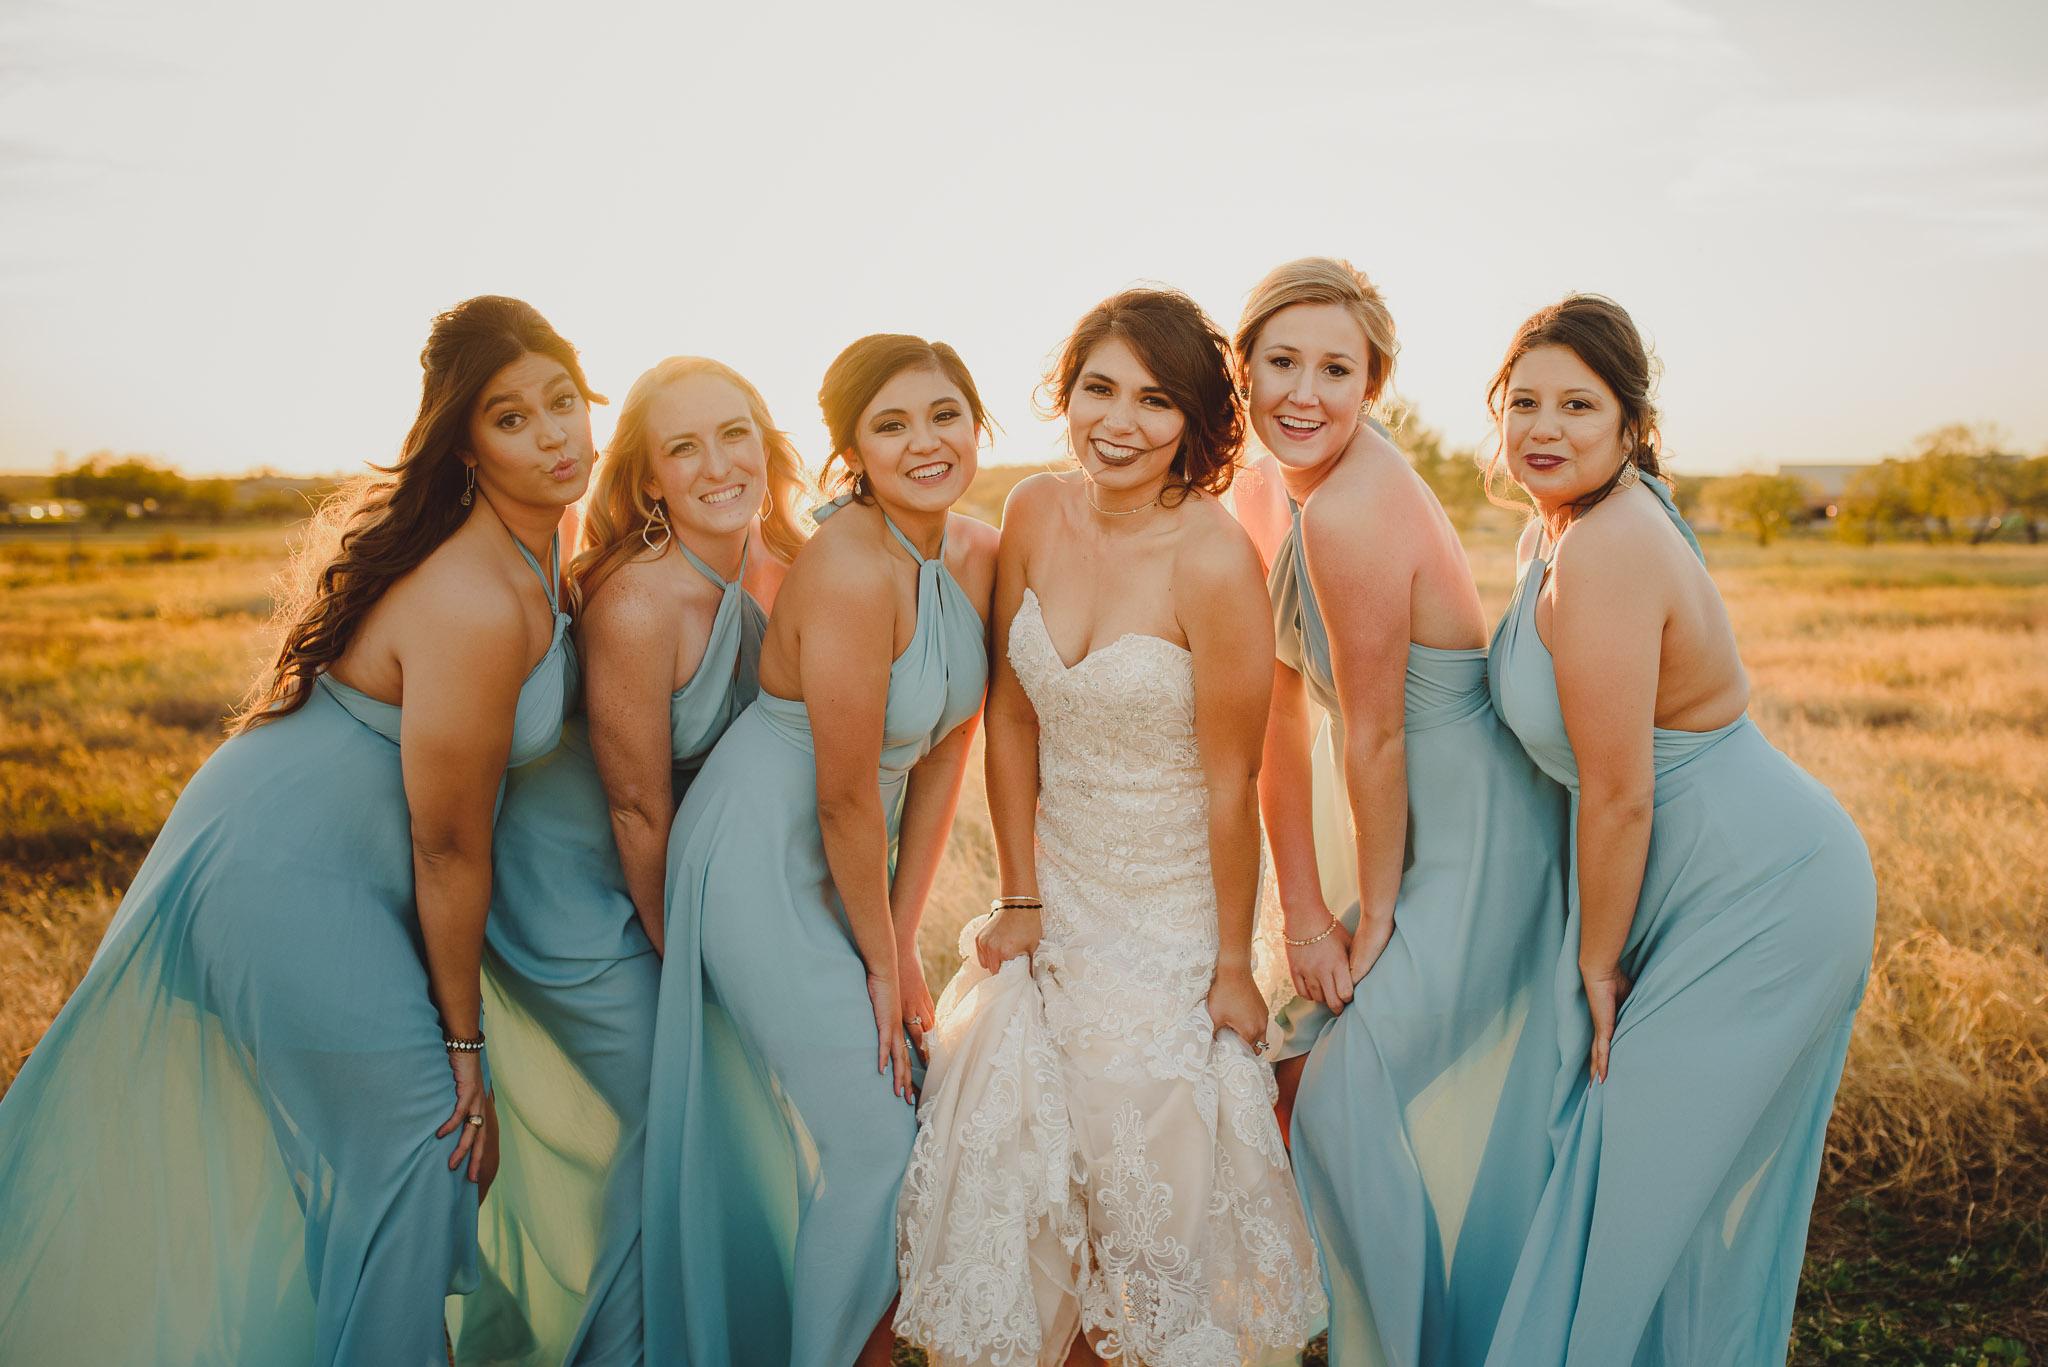 Zandra and her brides maids - San Angelo, Texas